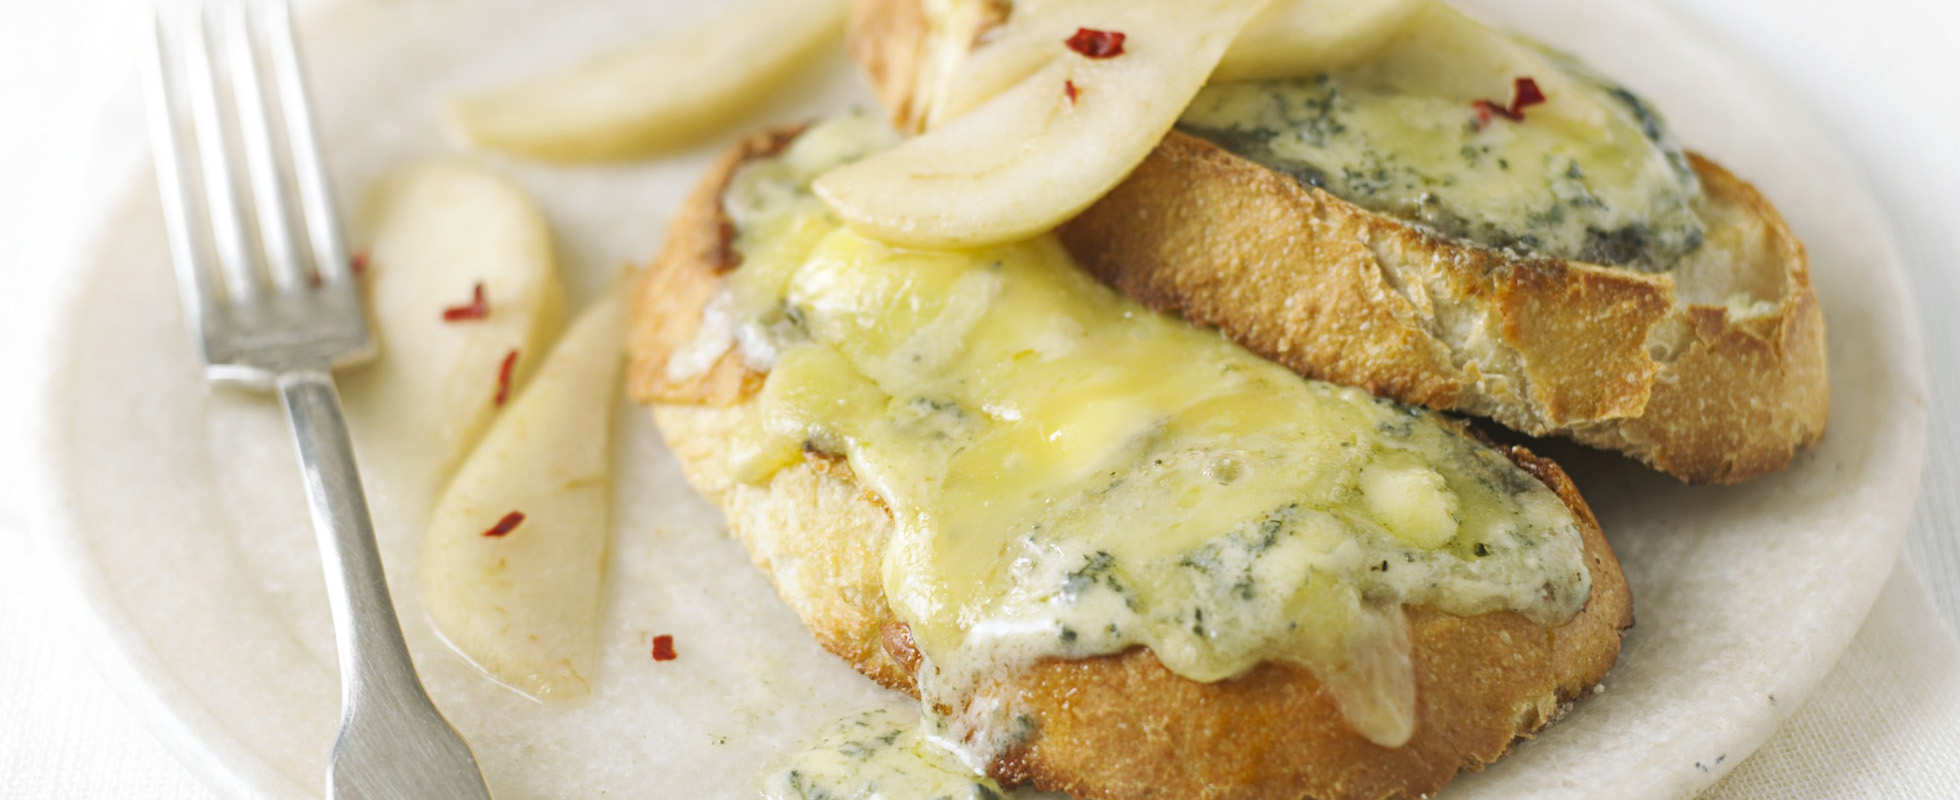 stilton on toast with pickled pears